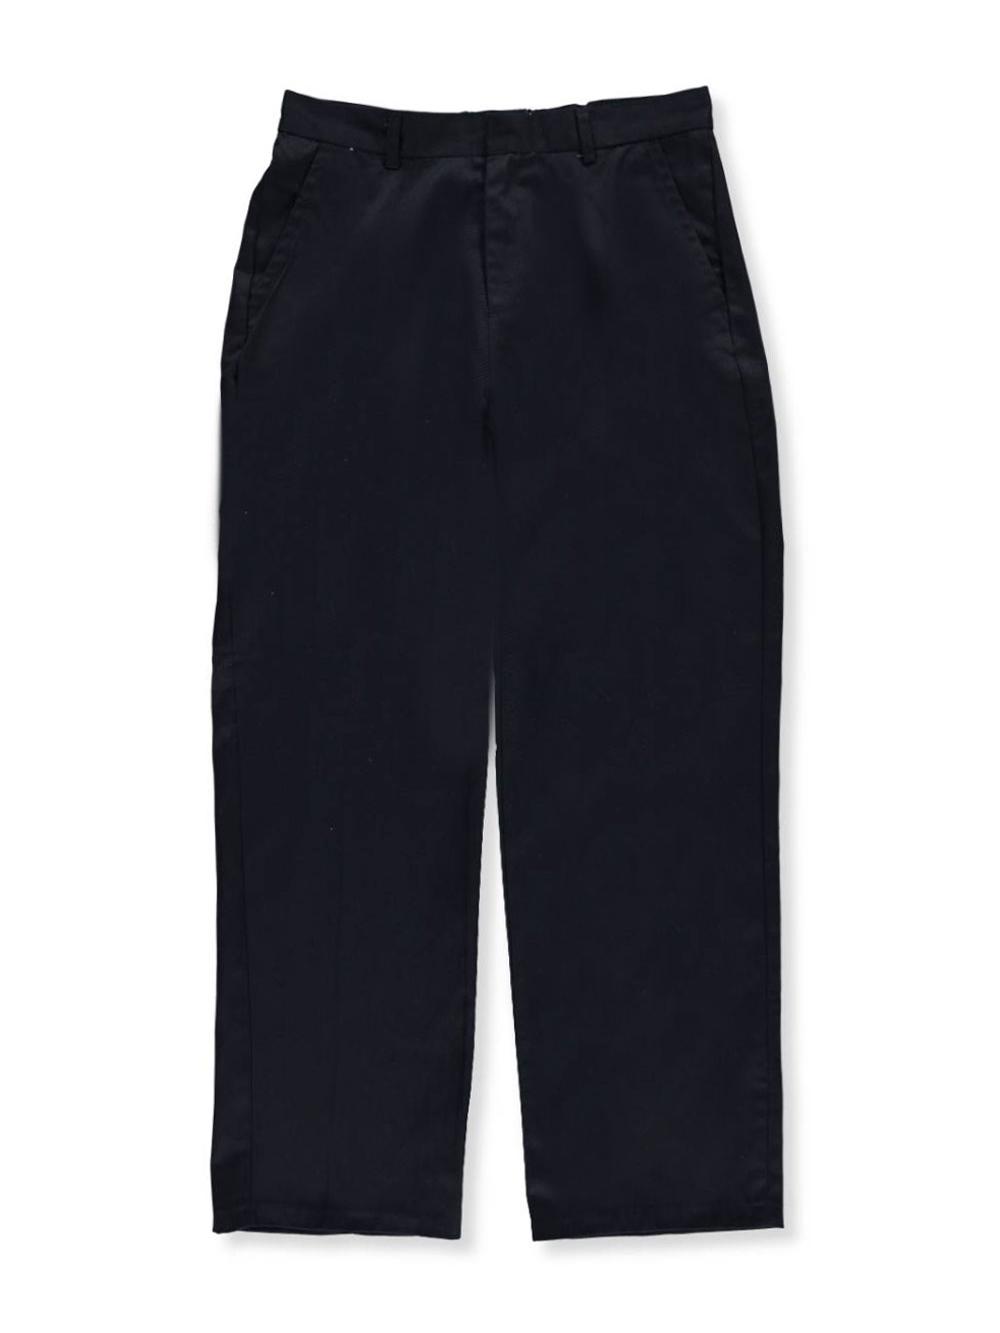 Image of Preferred School Uniforms Big Boys Husky Flat Front Pants Husky Sizes  midnight navy 20h